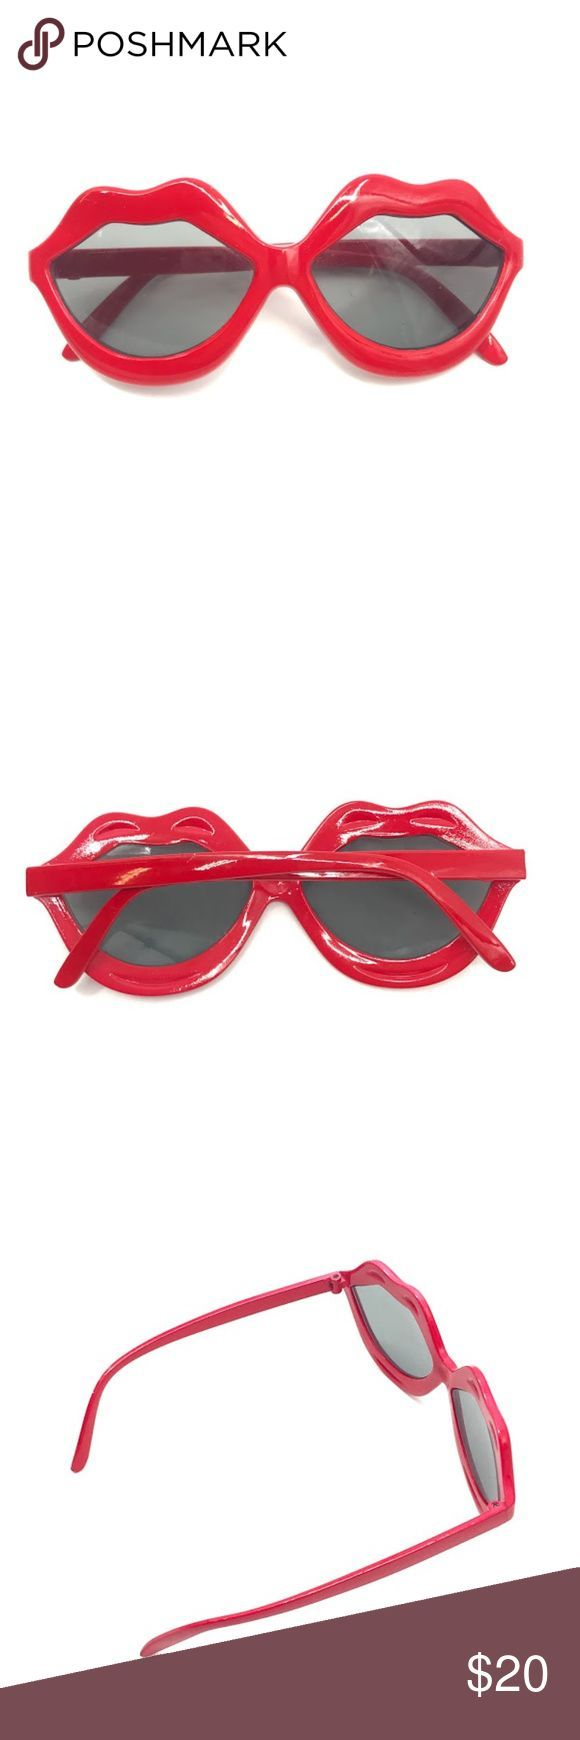 Rote Lippen geformte Sonnenbrille rote Lippen geformte Sonnenbrille funky einzigartige Sommer... #lipsshape